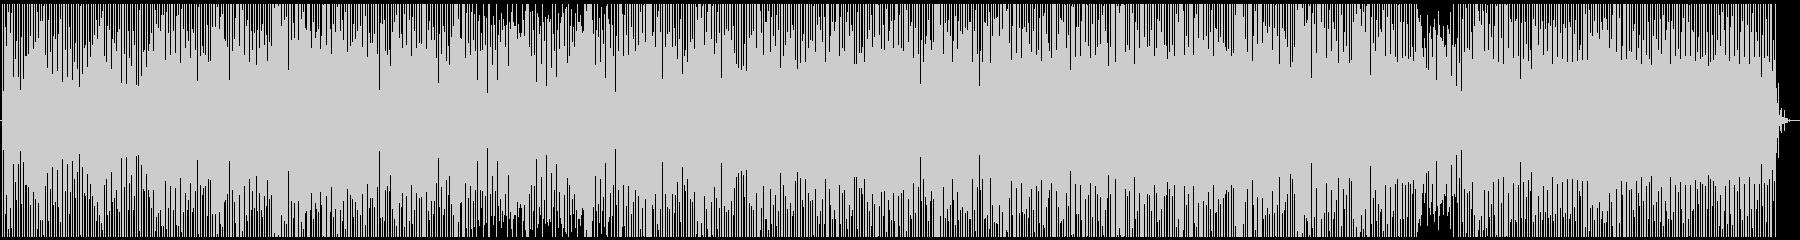 minimal dub technoの未再生の波形